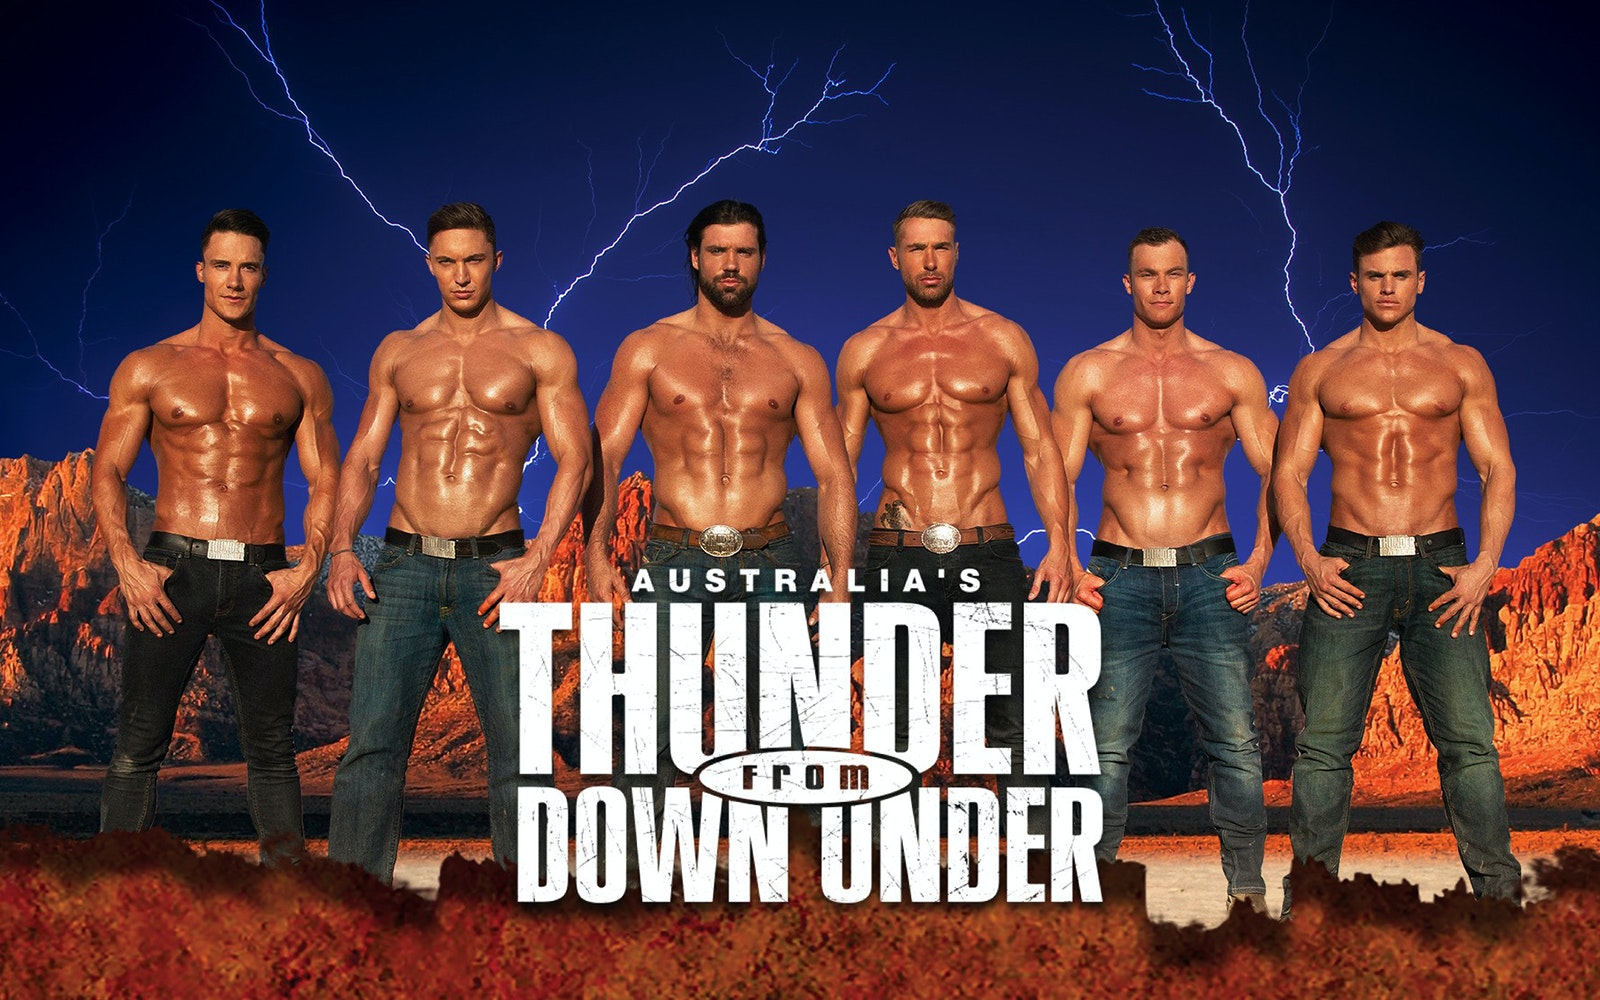 thunder from down under las vegas tickets info reviews more rh blog headout com thunder down under las vegas coupons thunder down under las vegas nv